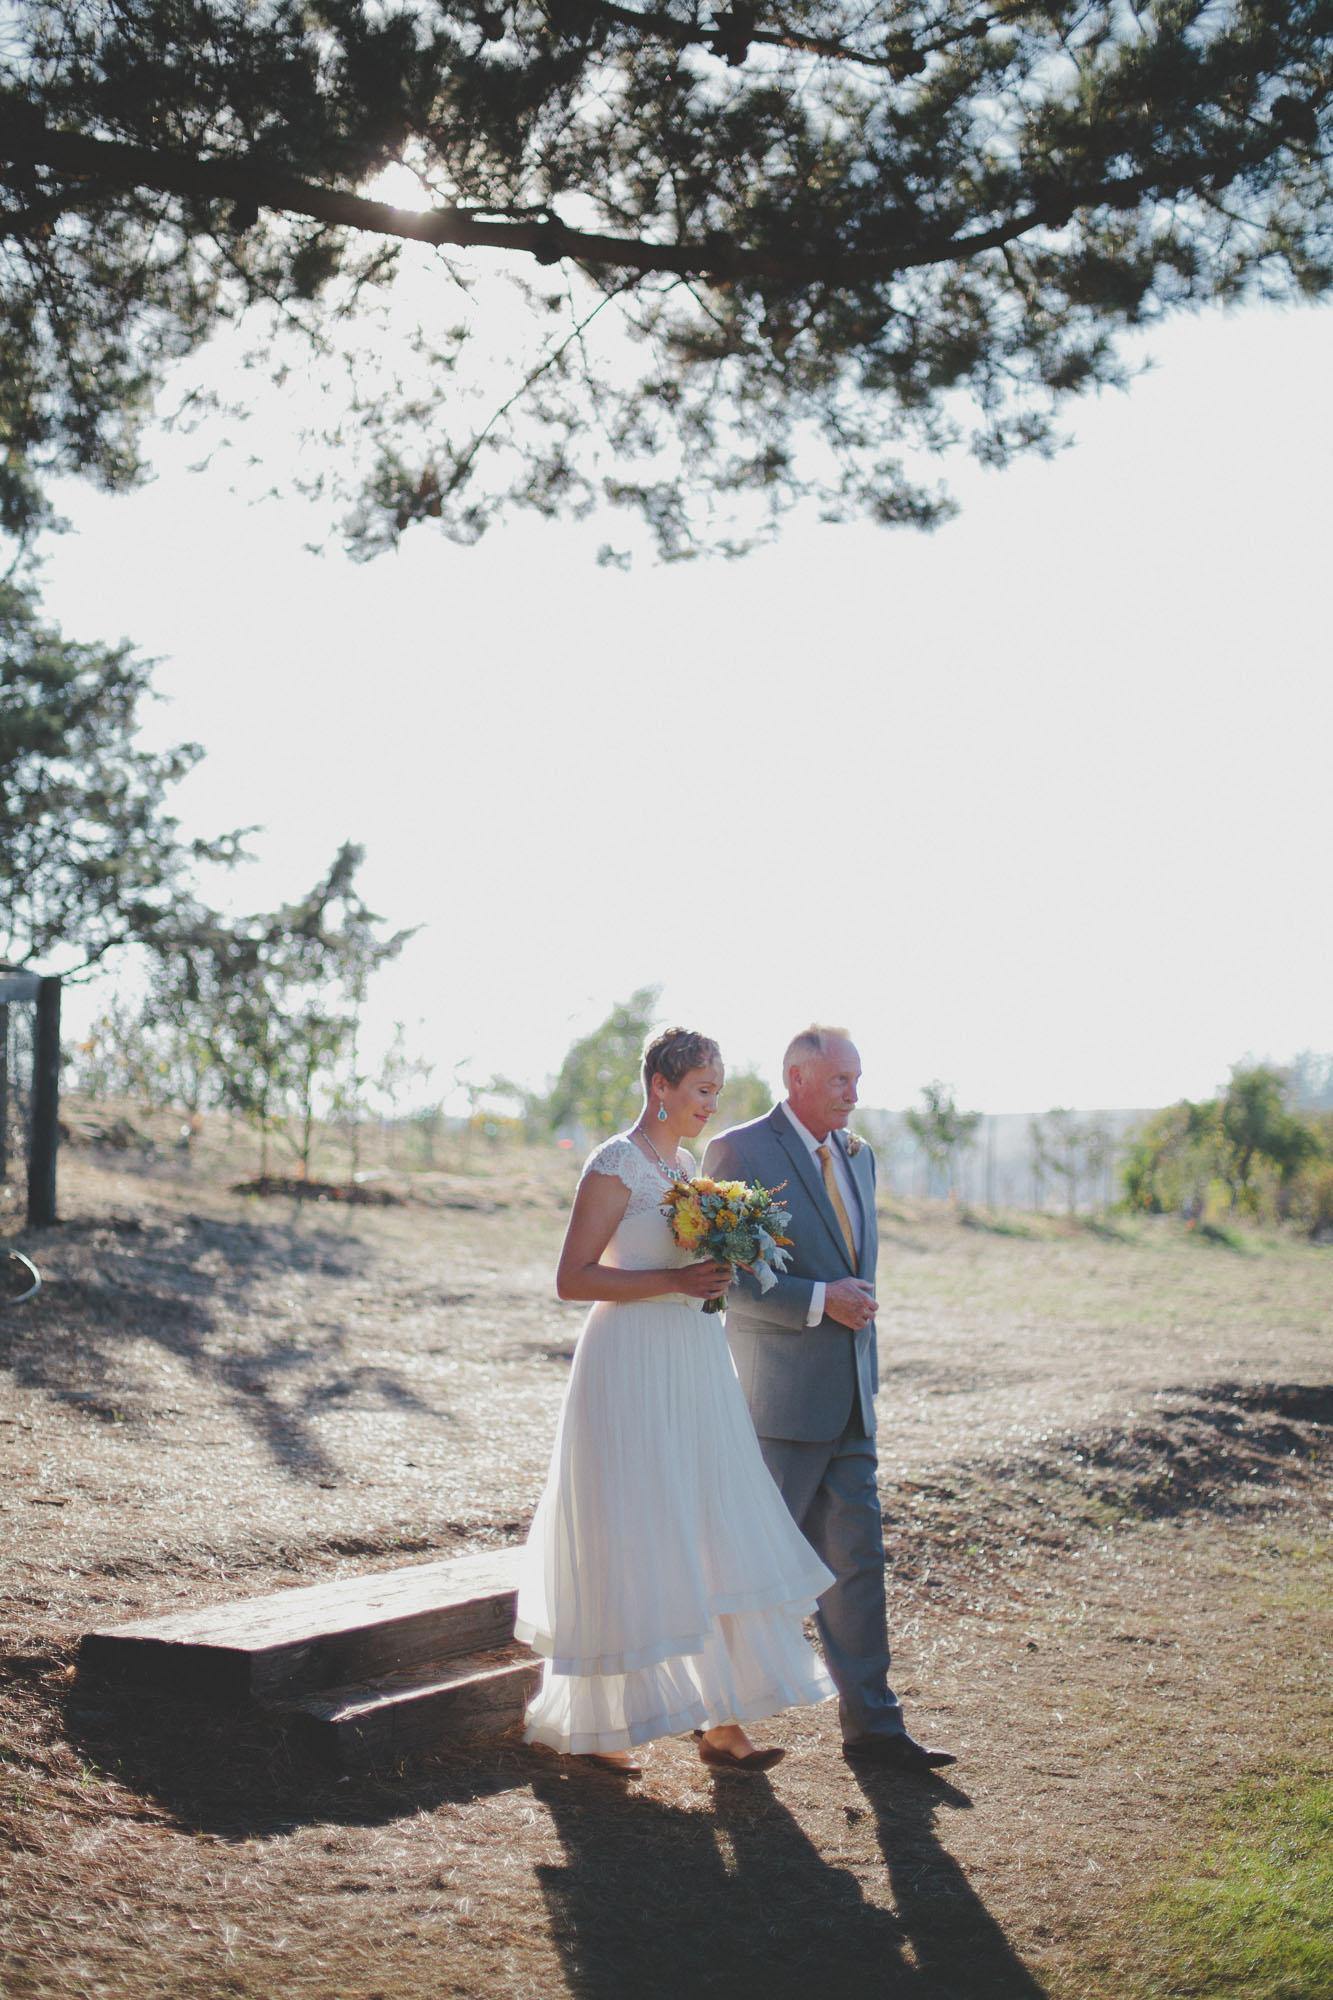 Gretchen_Gause_Petaluma_Olympias_Valley_Wedding_Photo-303.jpg